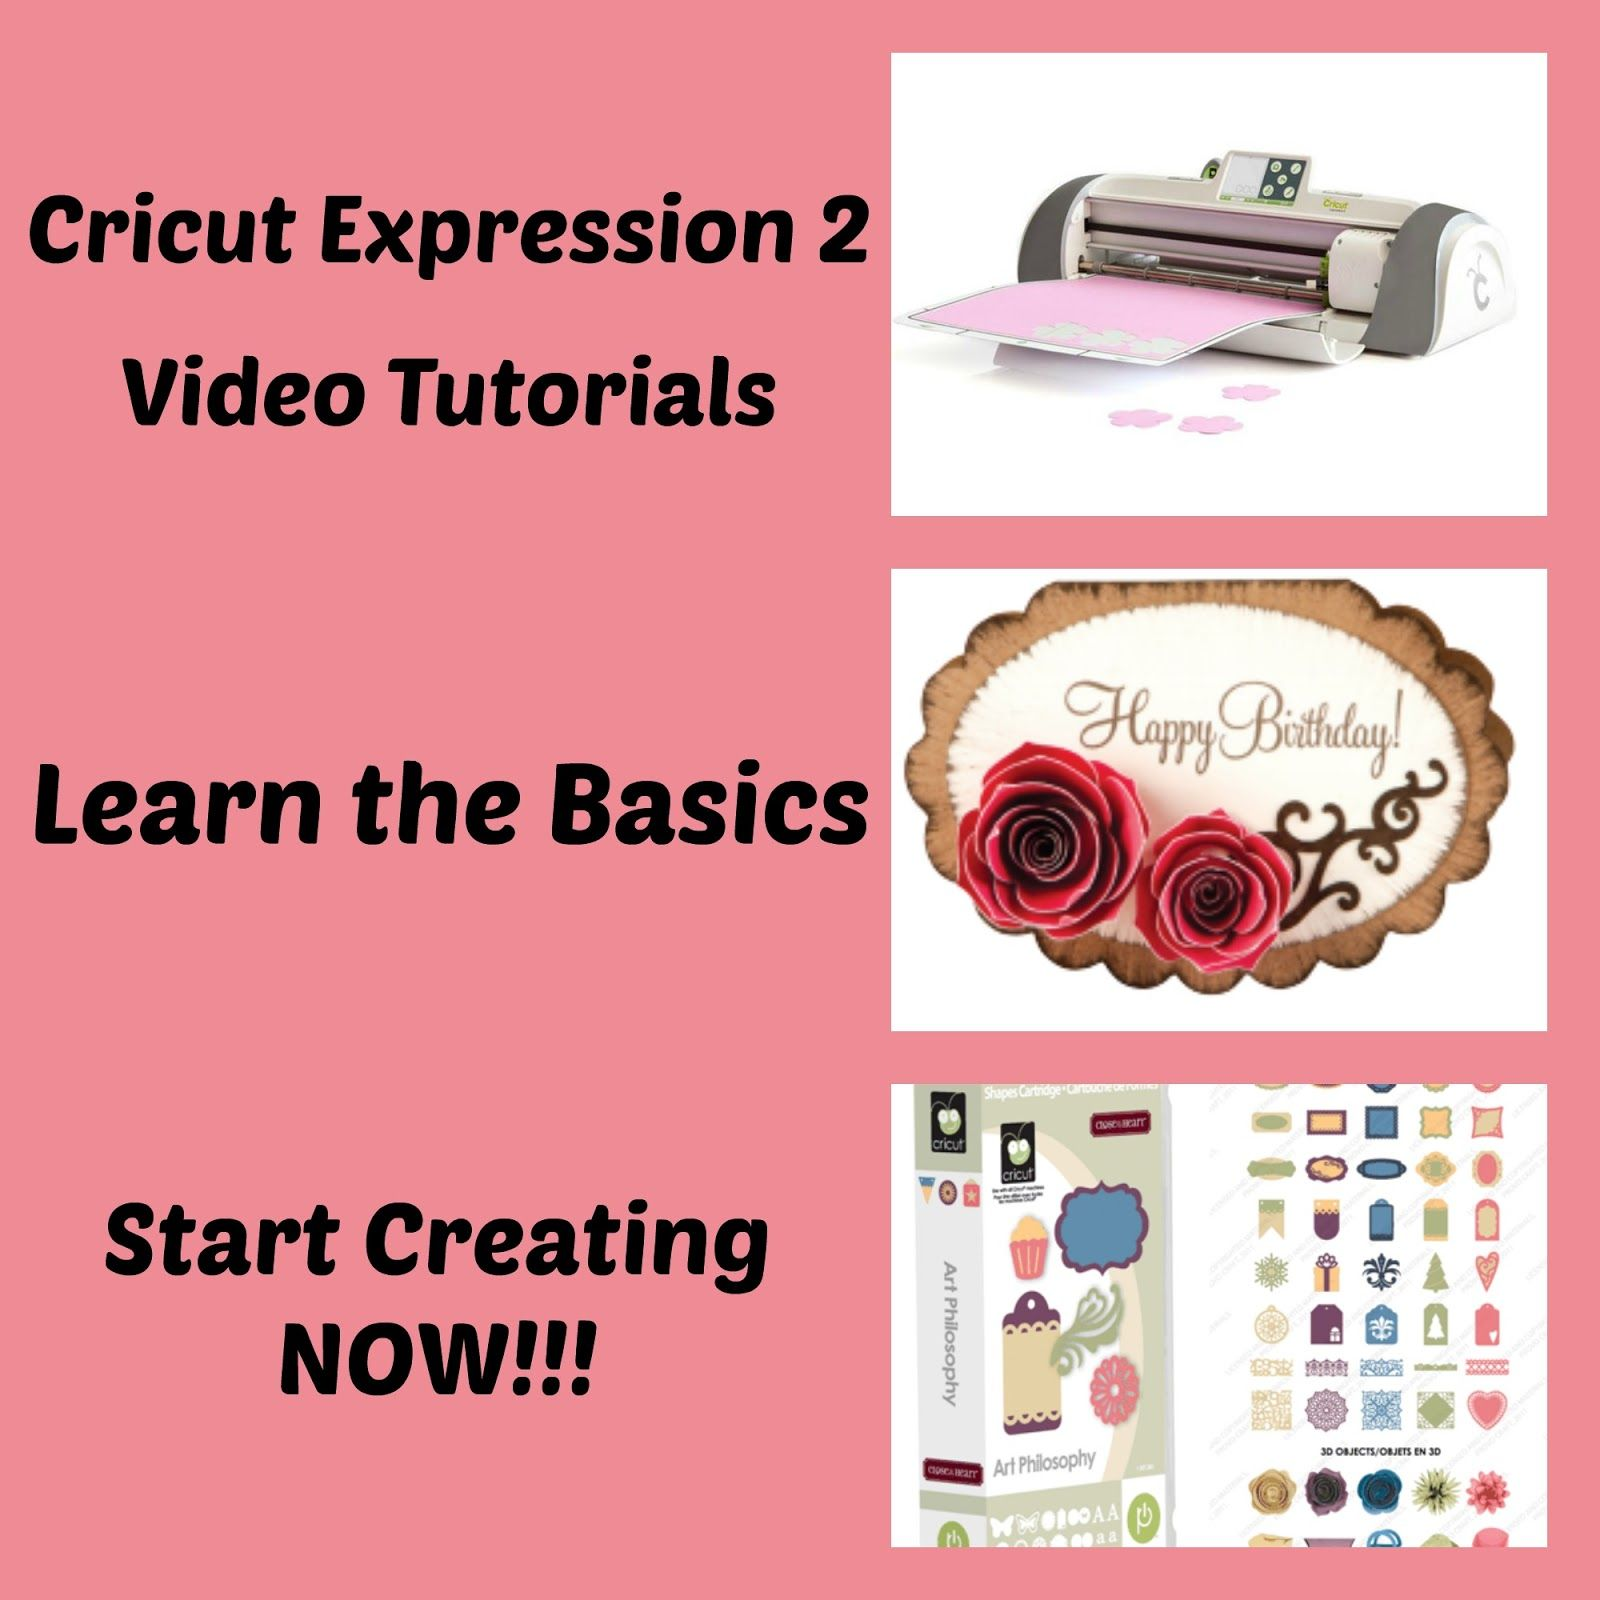 My Cricut Closet: Cricut Expression 2 Video Tutorial Series - Learn the  basics of using the Cricut Expression 2